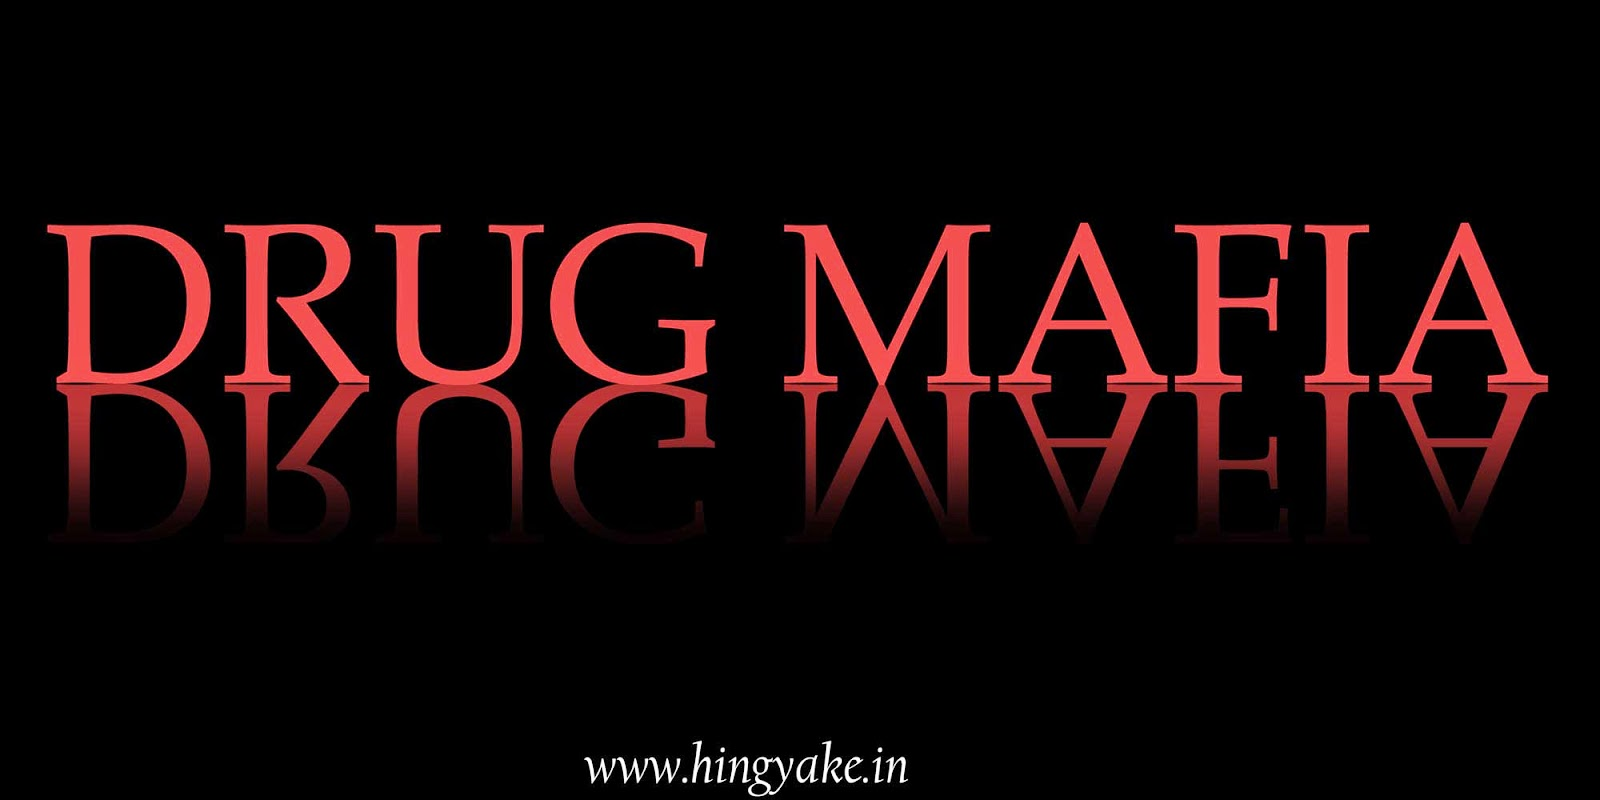 drug mafia hingyake